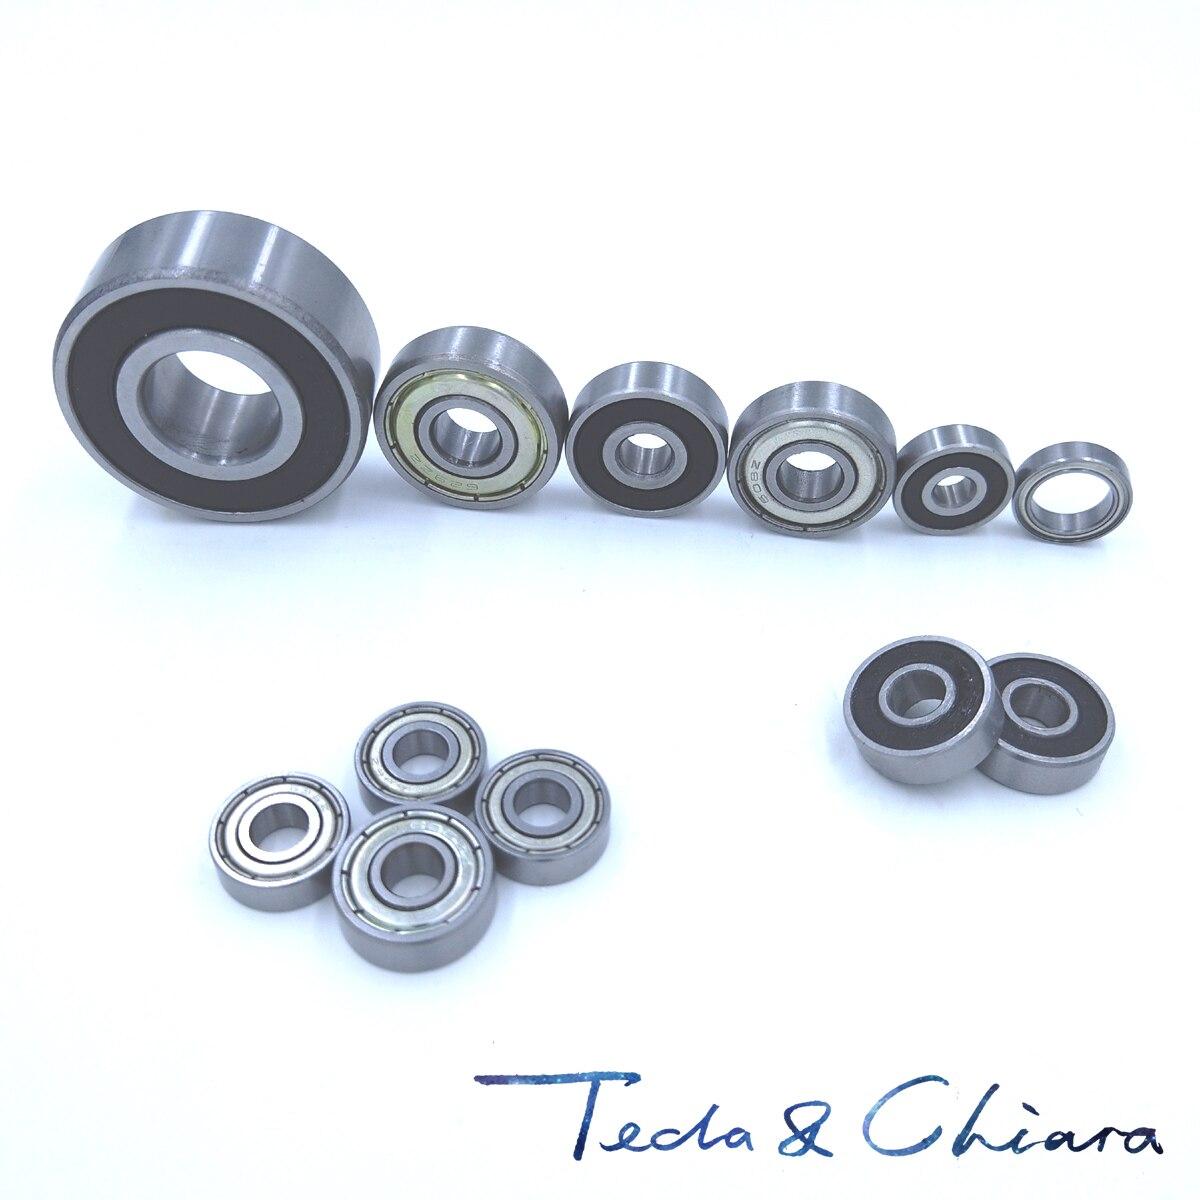 6003 6003ZZ 6003RS 6003-2Z 6003Z 6003-2RS ZZ RS RZ 2RZ Deep Groove Ball Bearings 17 X 35 X 10mm